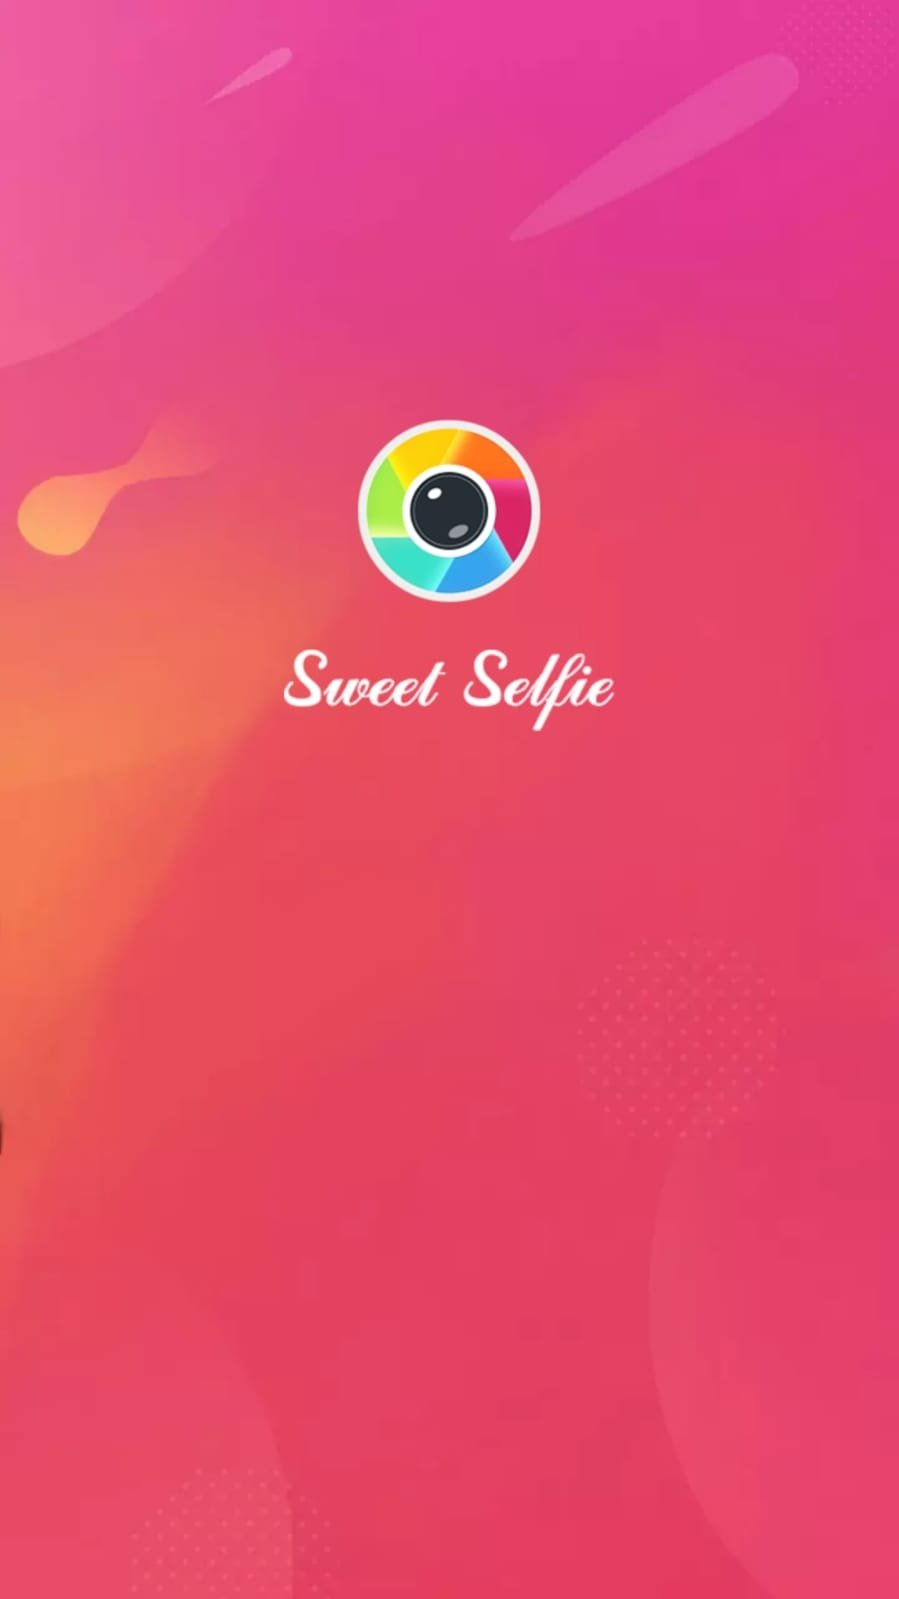 Sweet Selfie 3 2 1105 - Baixar para Android APK Grátis